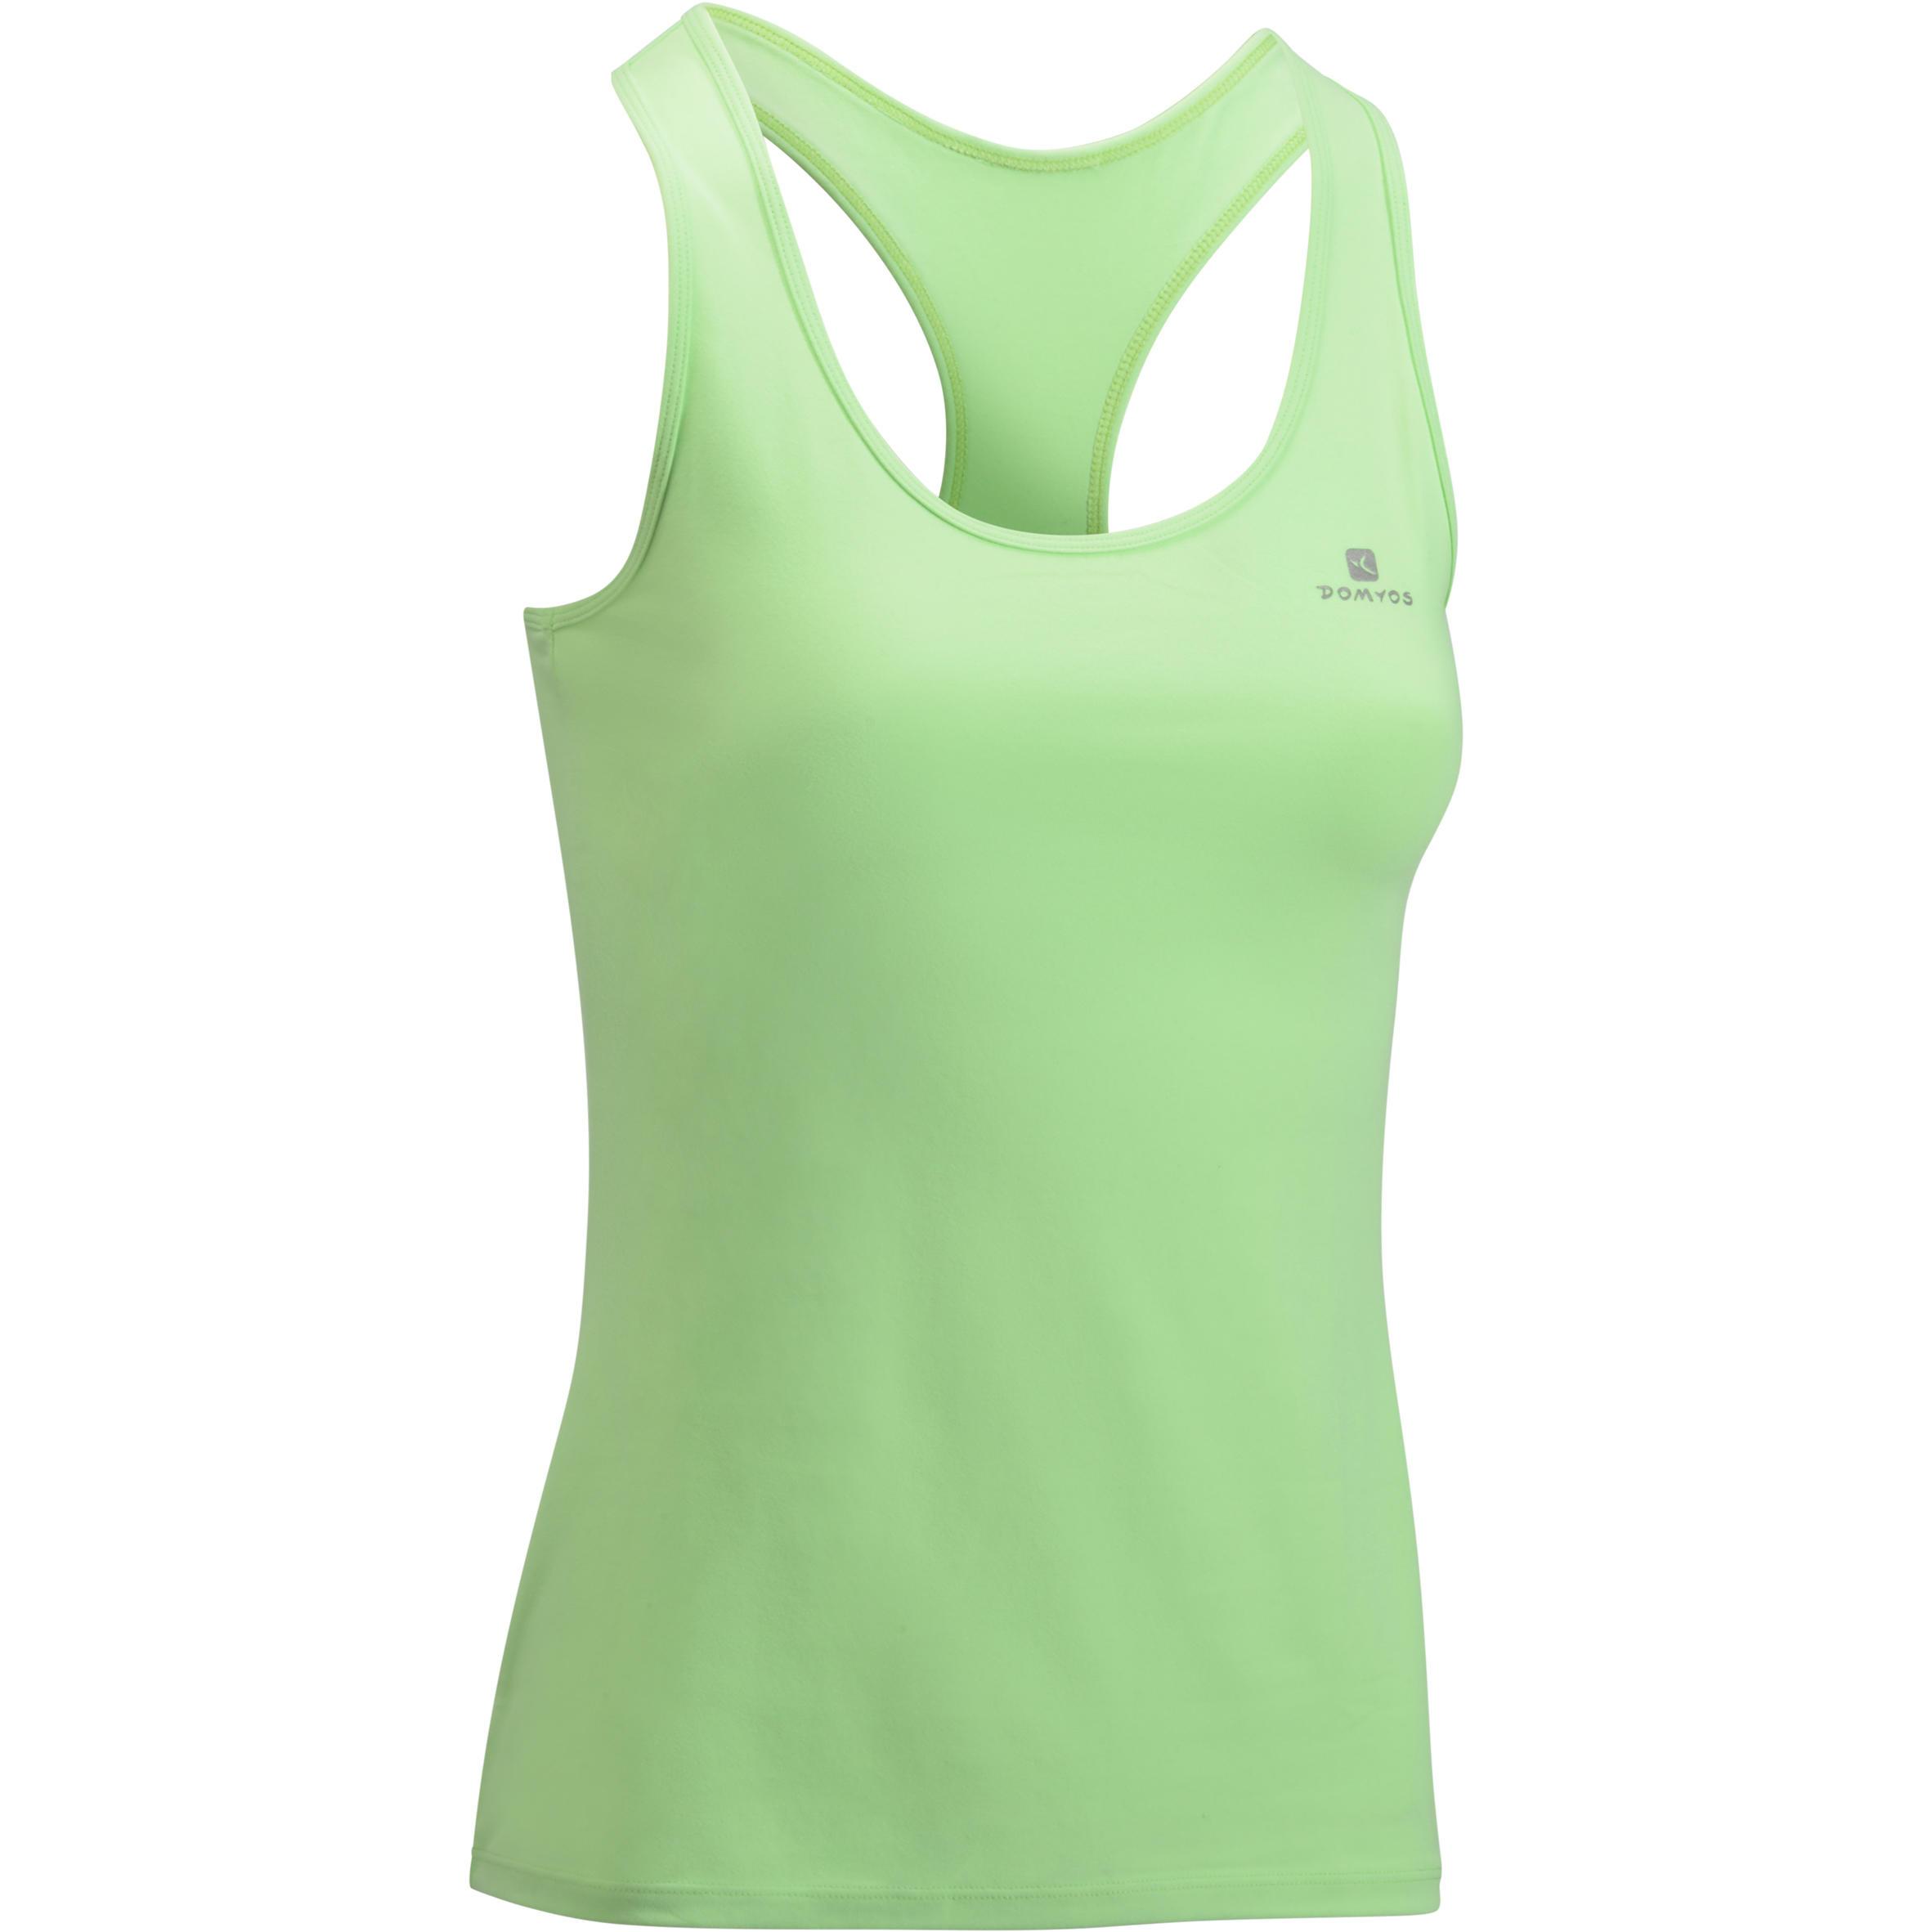 100 My Top Women's Cardio Fitness Tank Top - Mint Green